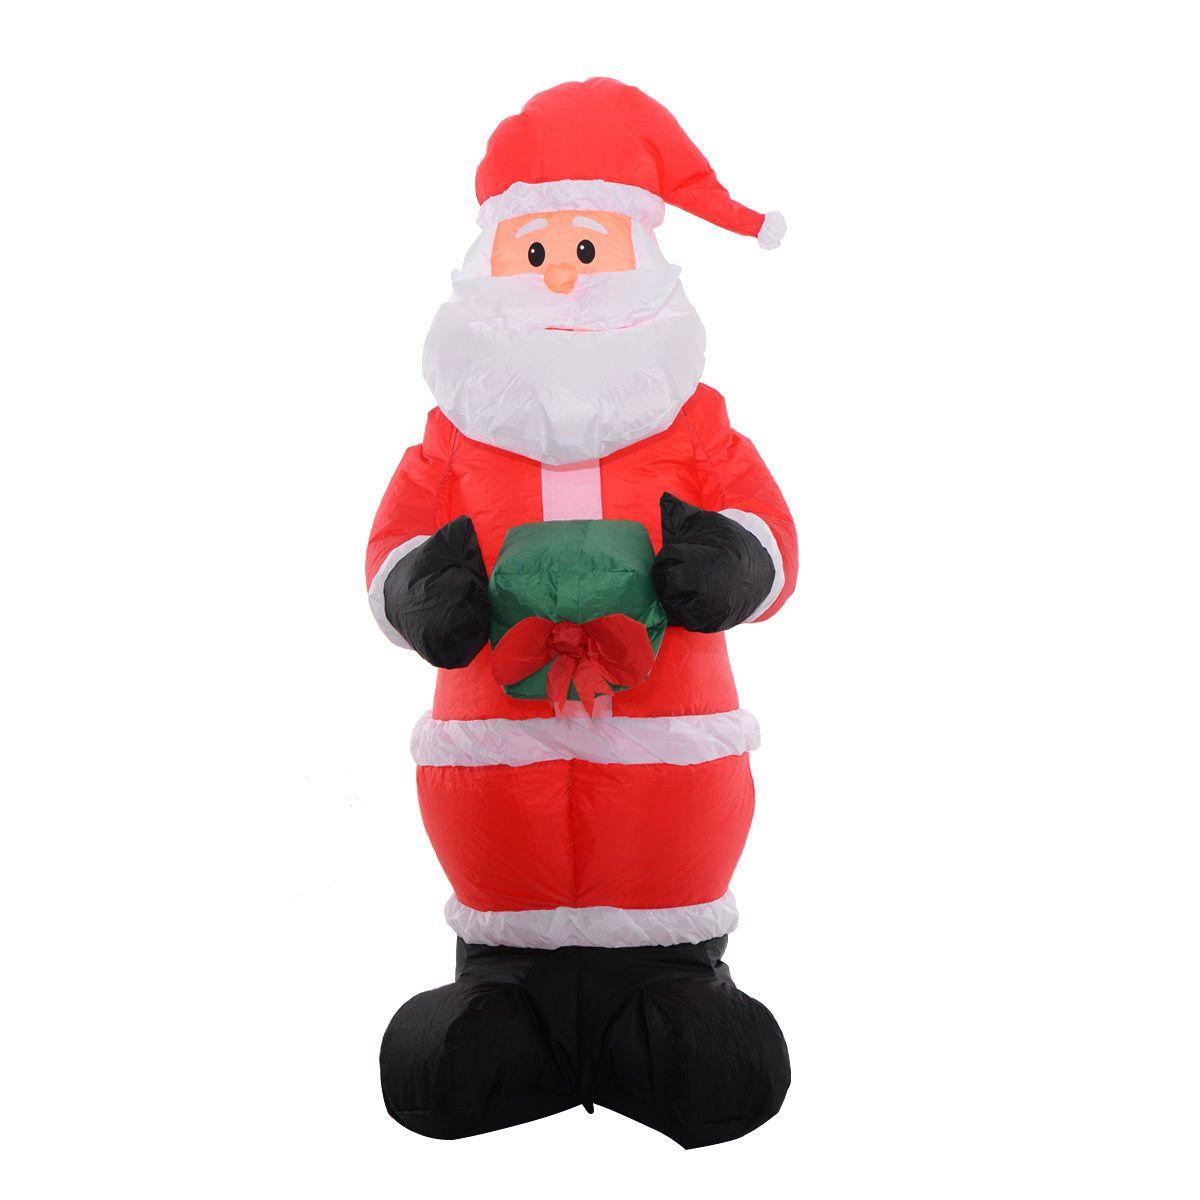 6Ft Airblown Inflatable Christmas Xmas Santa Claus Decoration Lawn ...